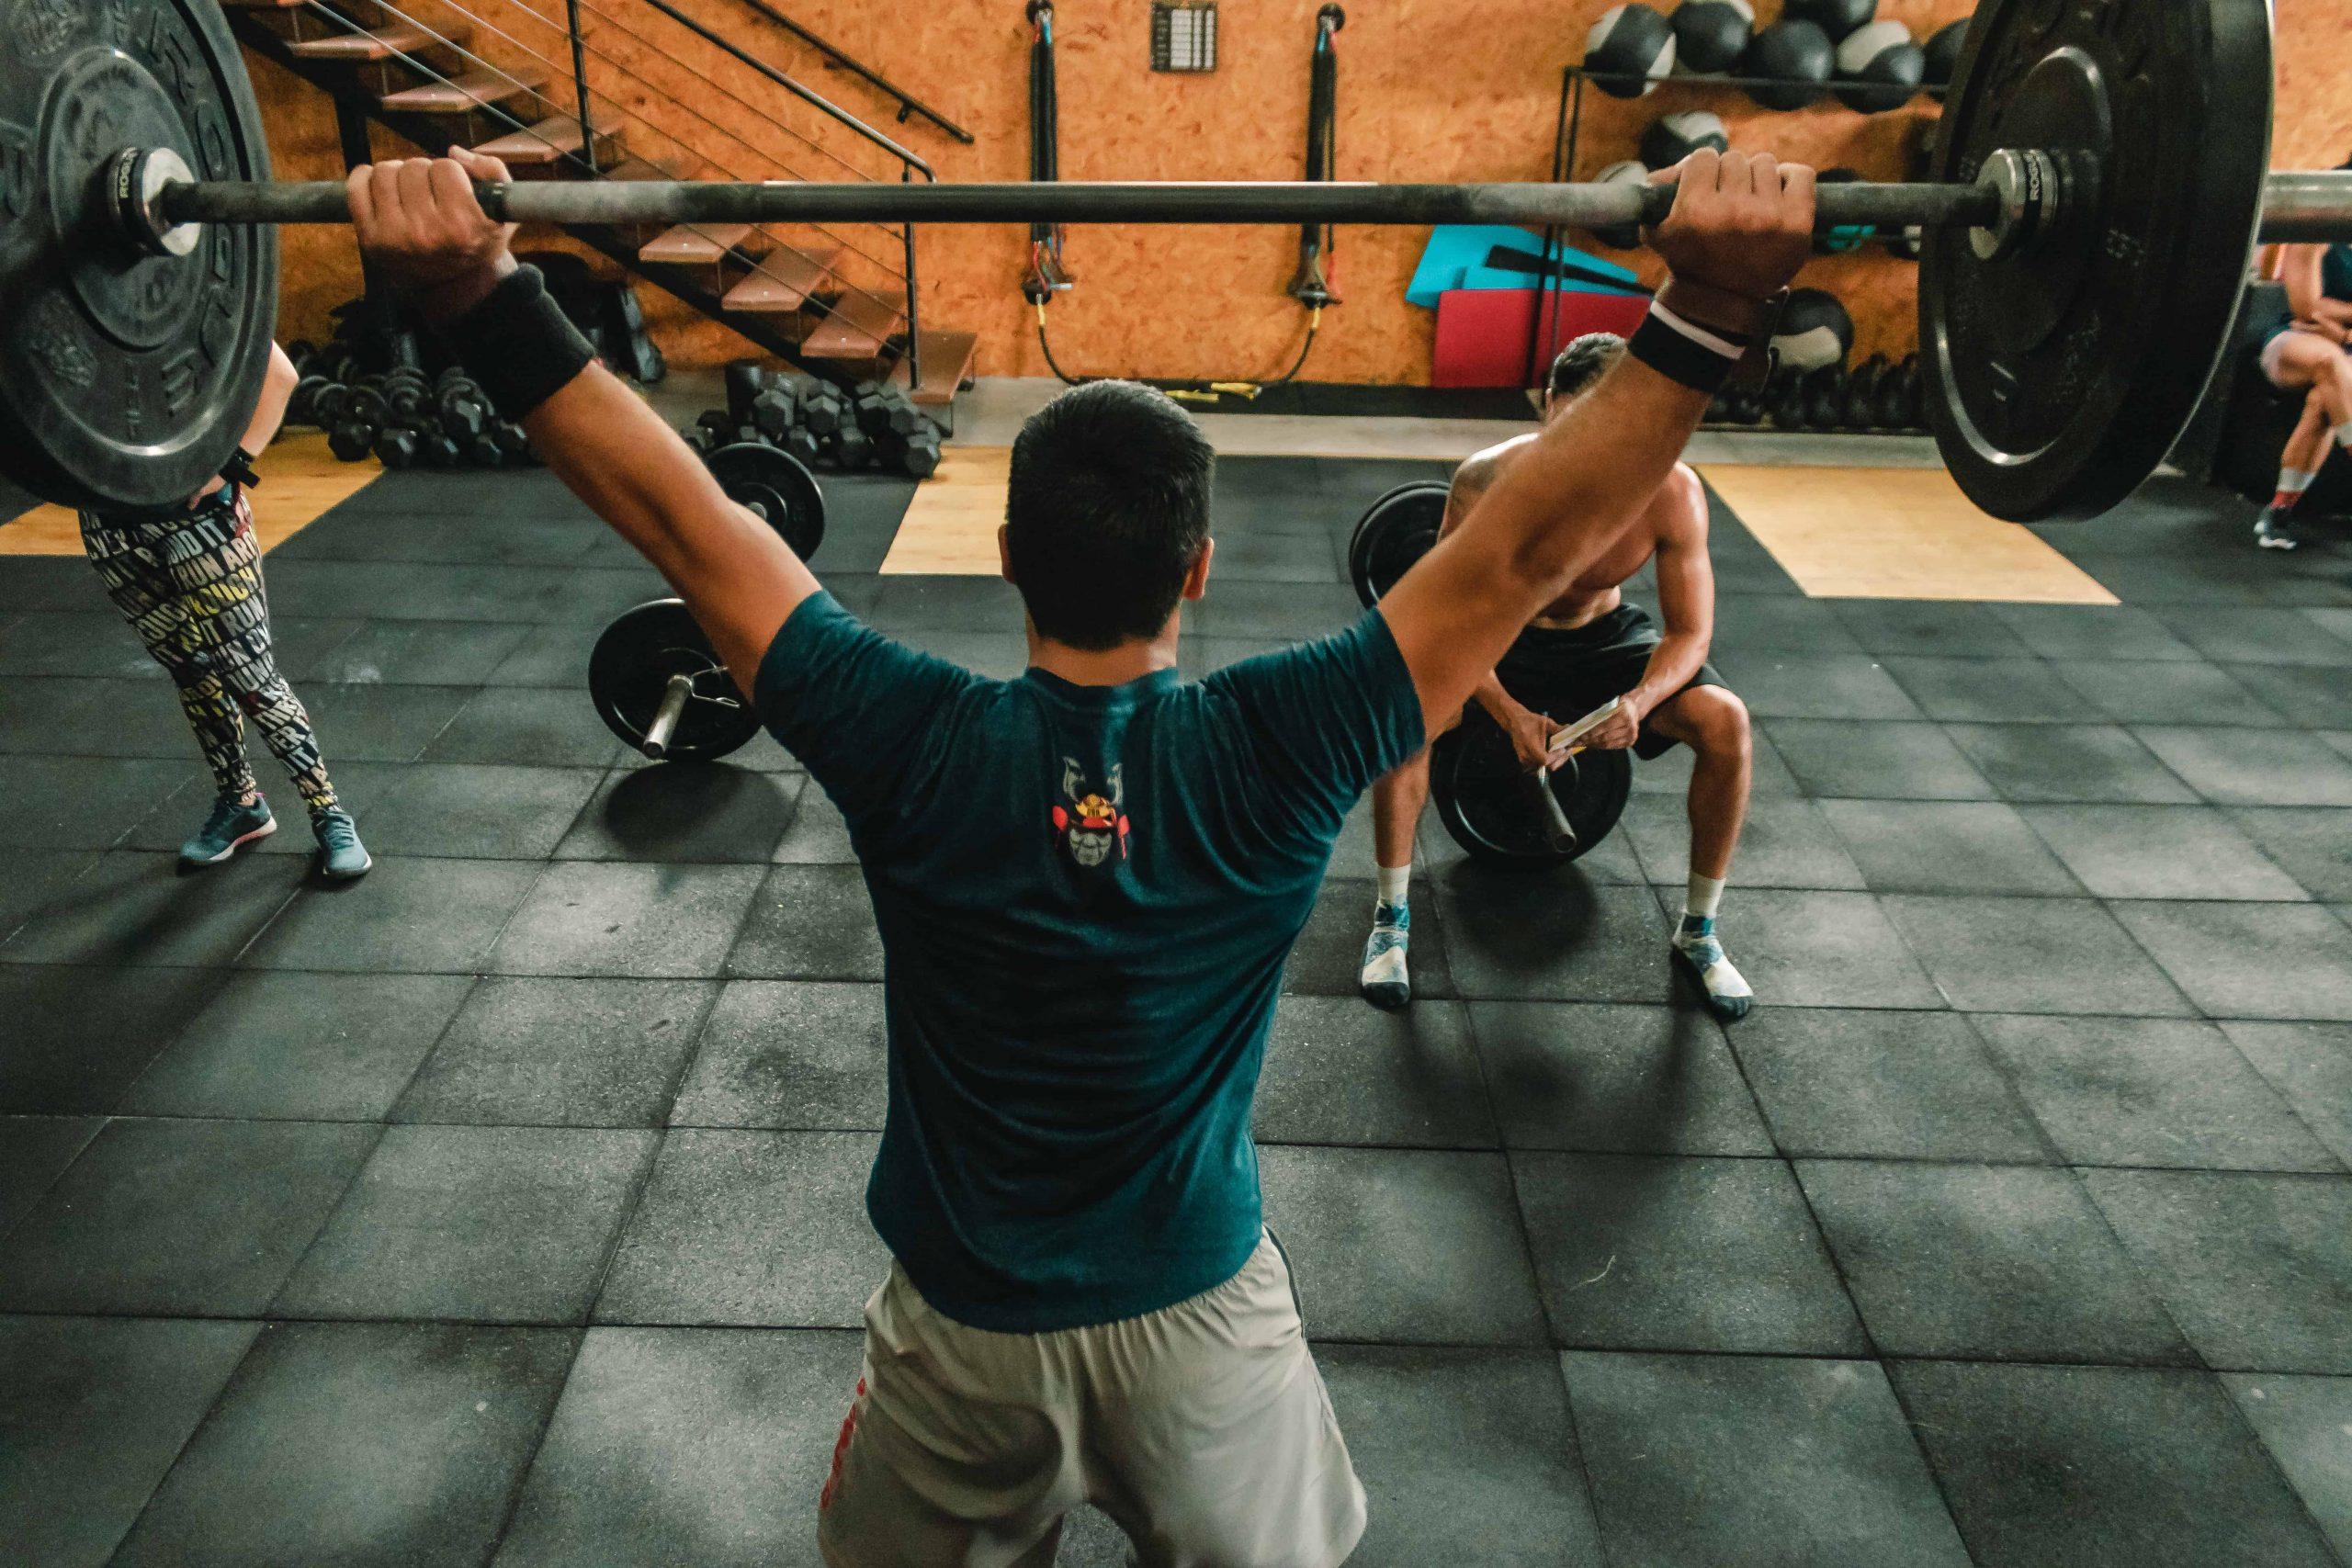 Fitnesstrainer Gehalt: Das verdienst du als Fitnesstrainer (2021)